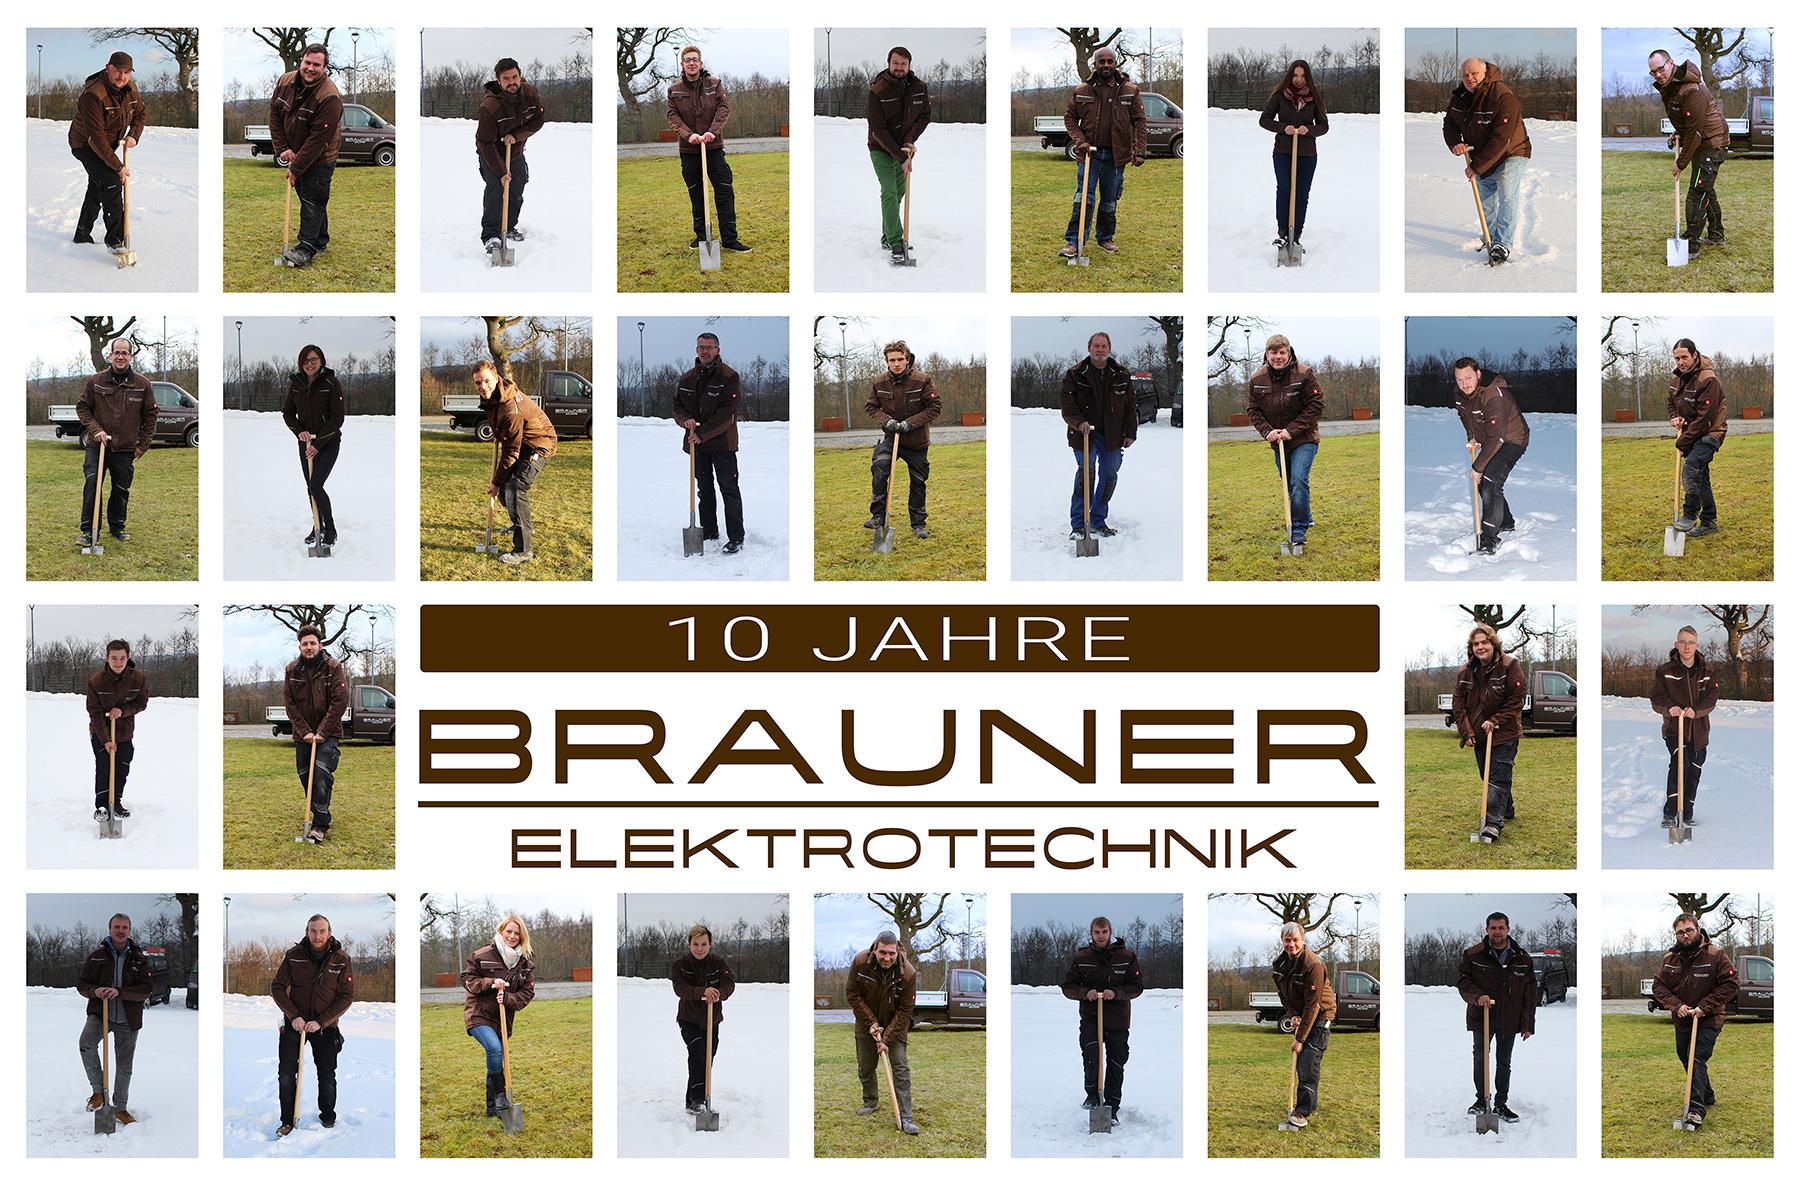 Teamfoto Brauner Elektrotechnik - Spatenstich neues Buerogebaeude